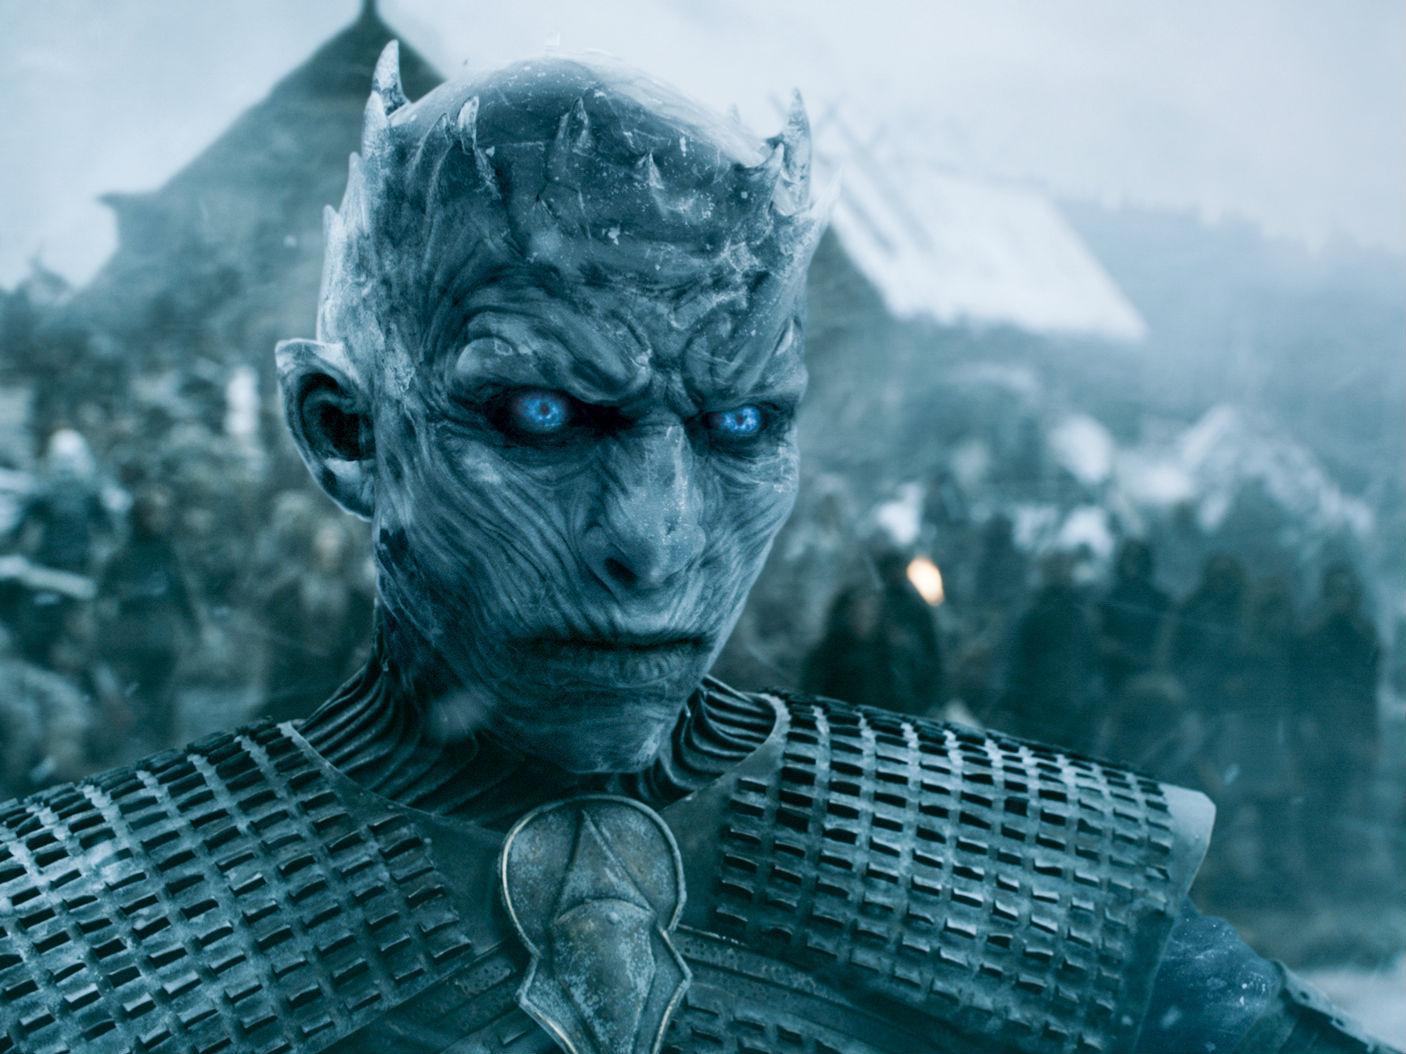 Game of Thrones season 8: Night King actor teases showdown with Jon Snow